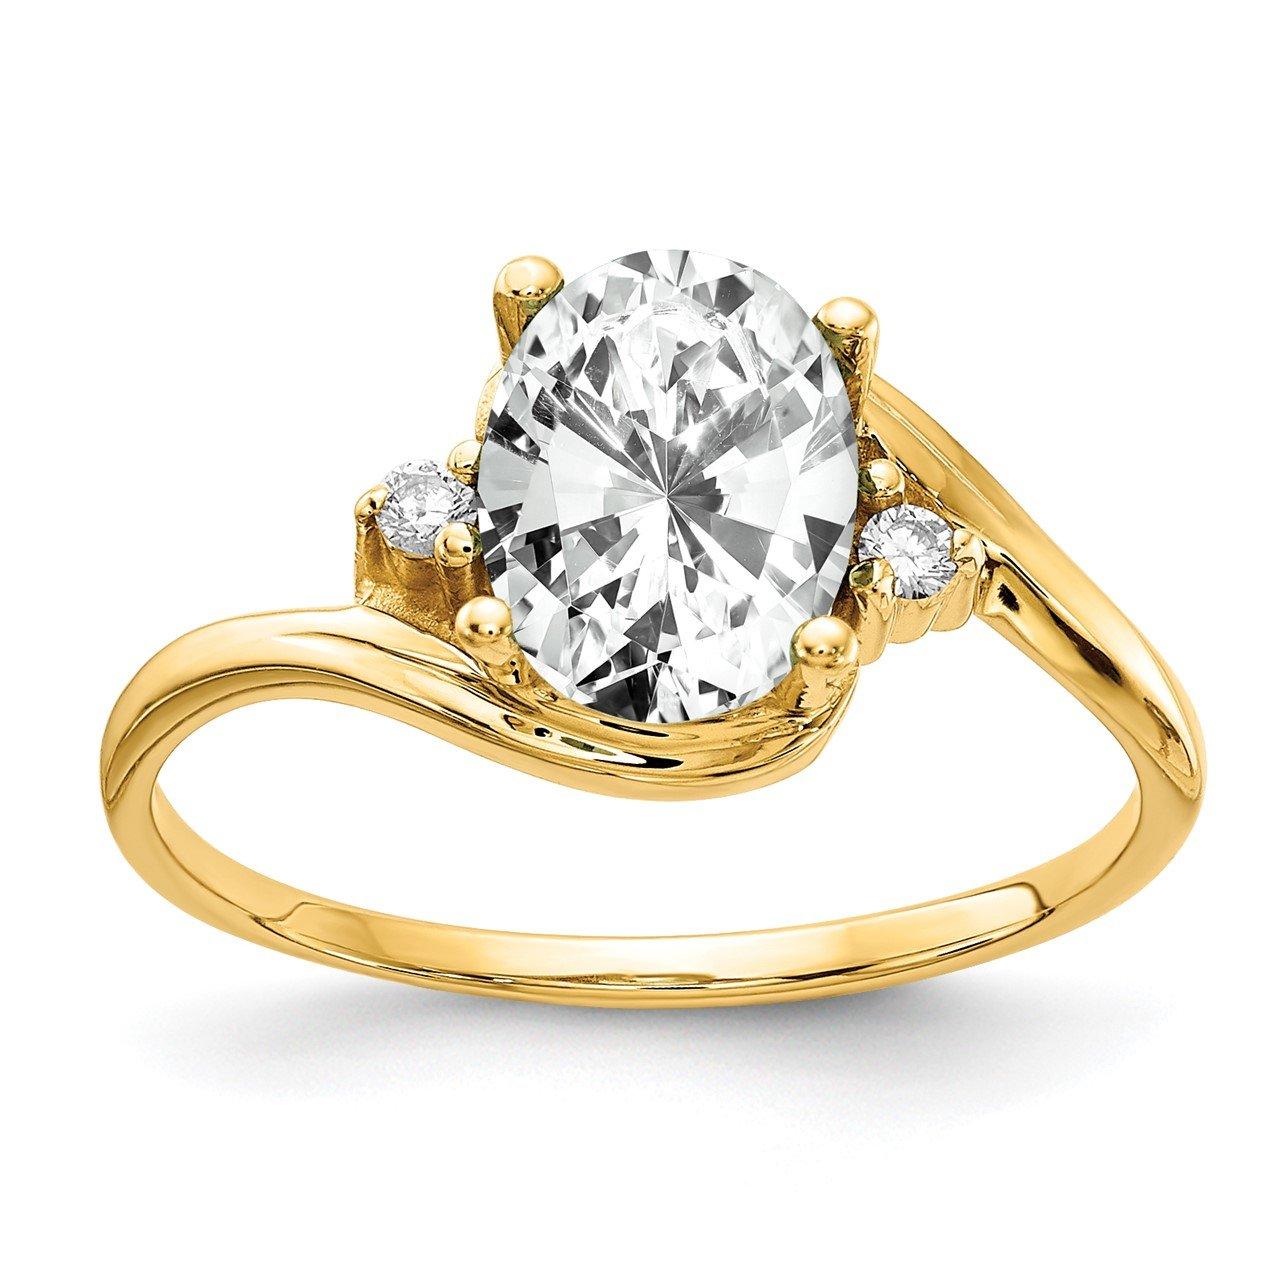 14k 8x6mm Oval Cubic Zirconia A Diamond Ring